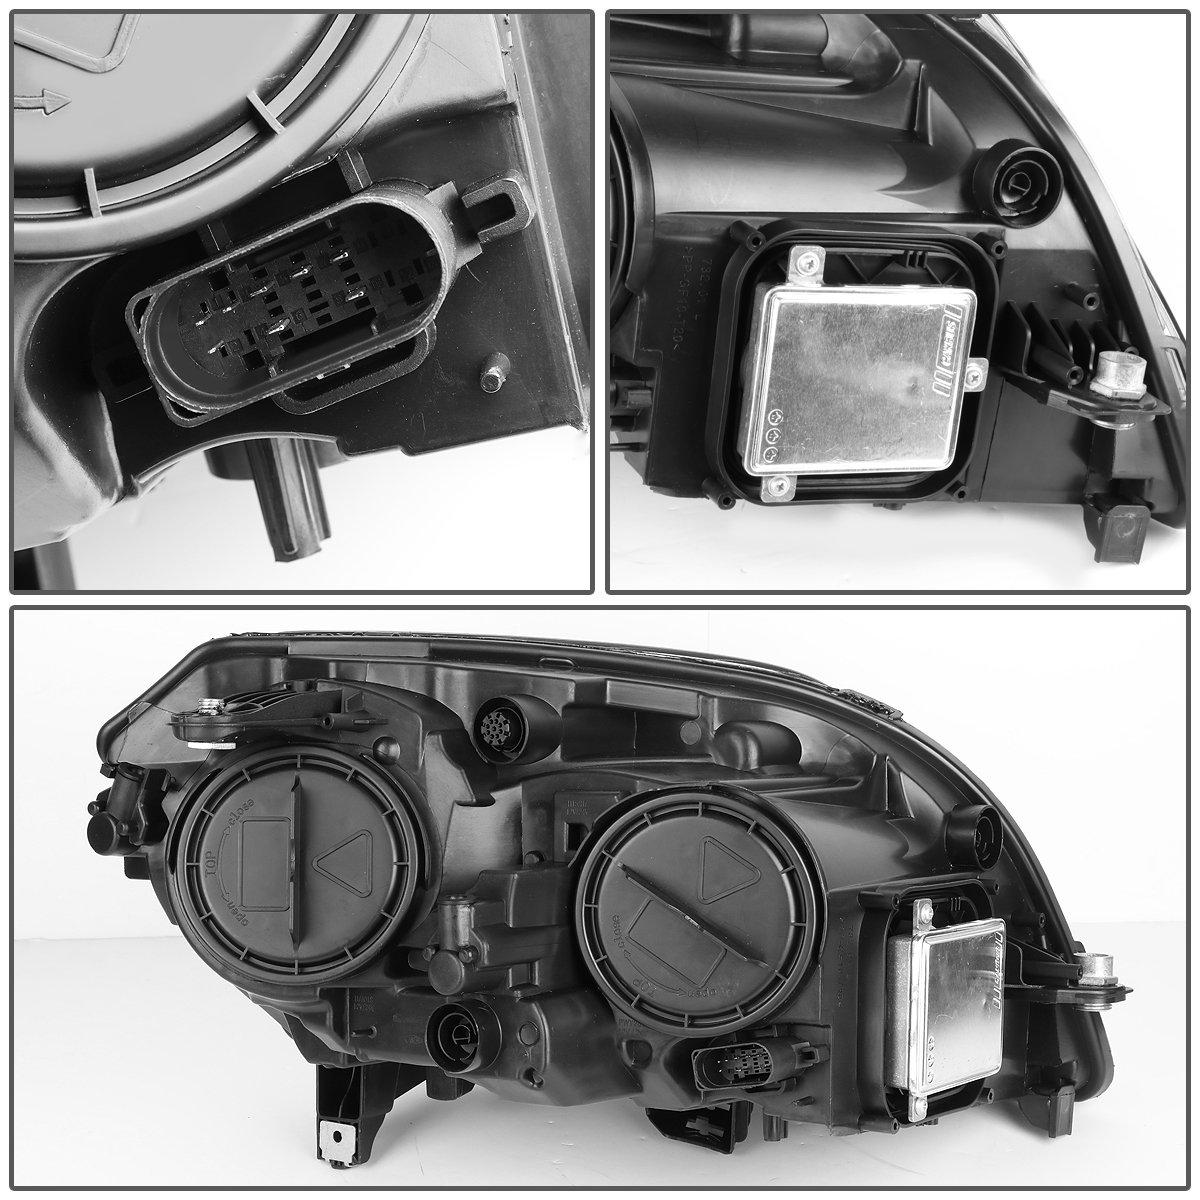 For 09 15 Mercedes Benz X204 Glk Class Pair Black 350 Engine Diagram Housing Hid Projector Headlight W Led Drl Turn Signal Light Automotive